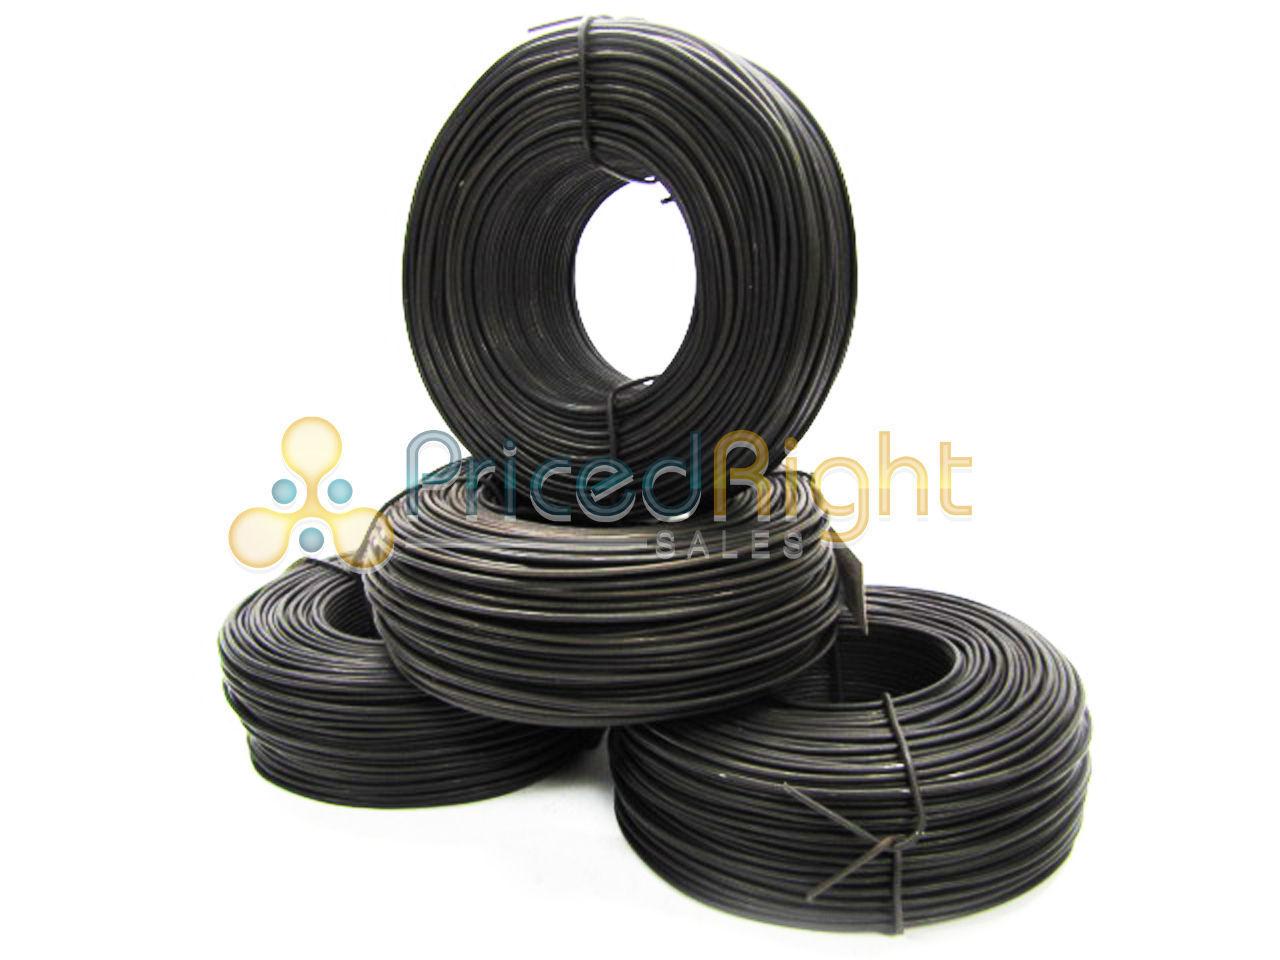 3 lb Pound Rolls Mechanic Rebar Tie Wire 16 Gauge Ga Lot of 4 Black ...